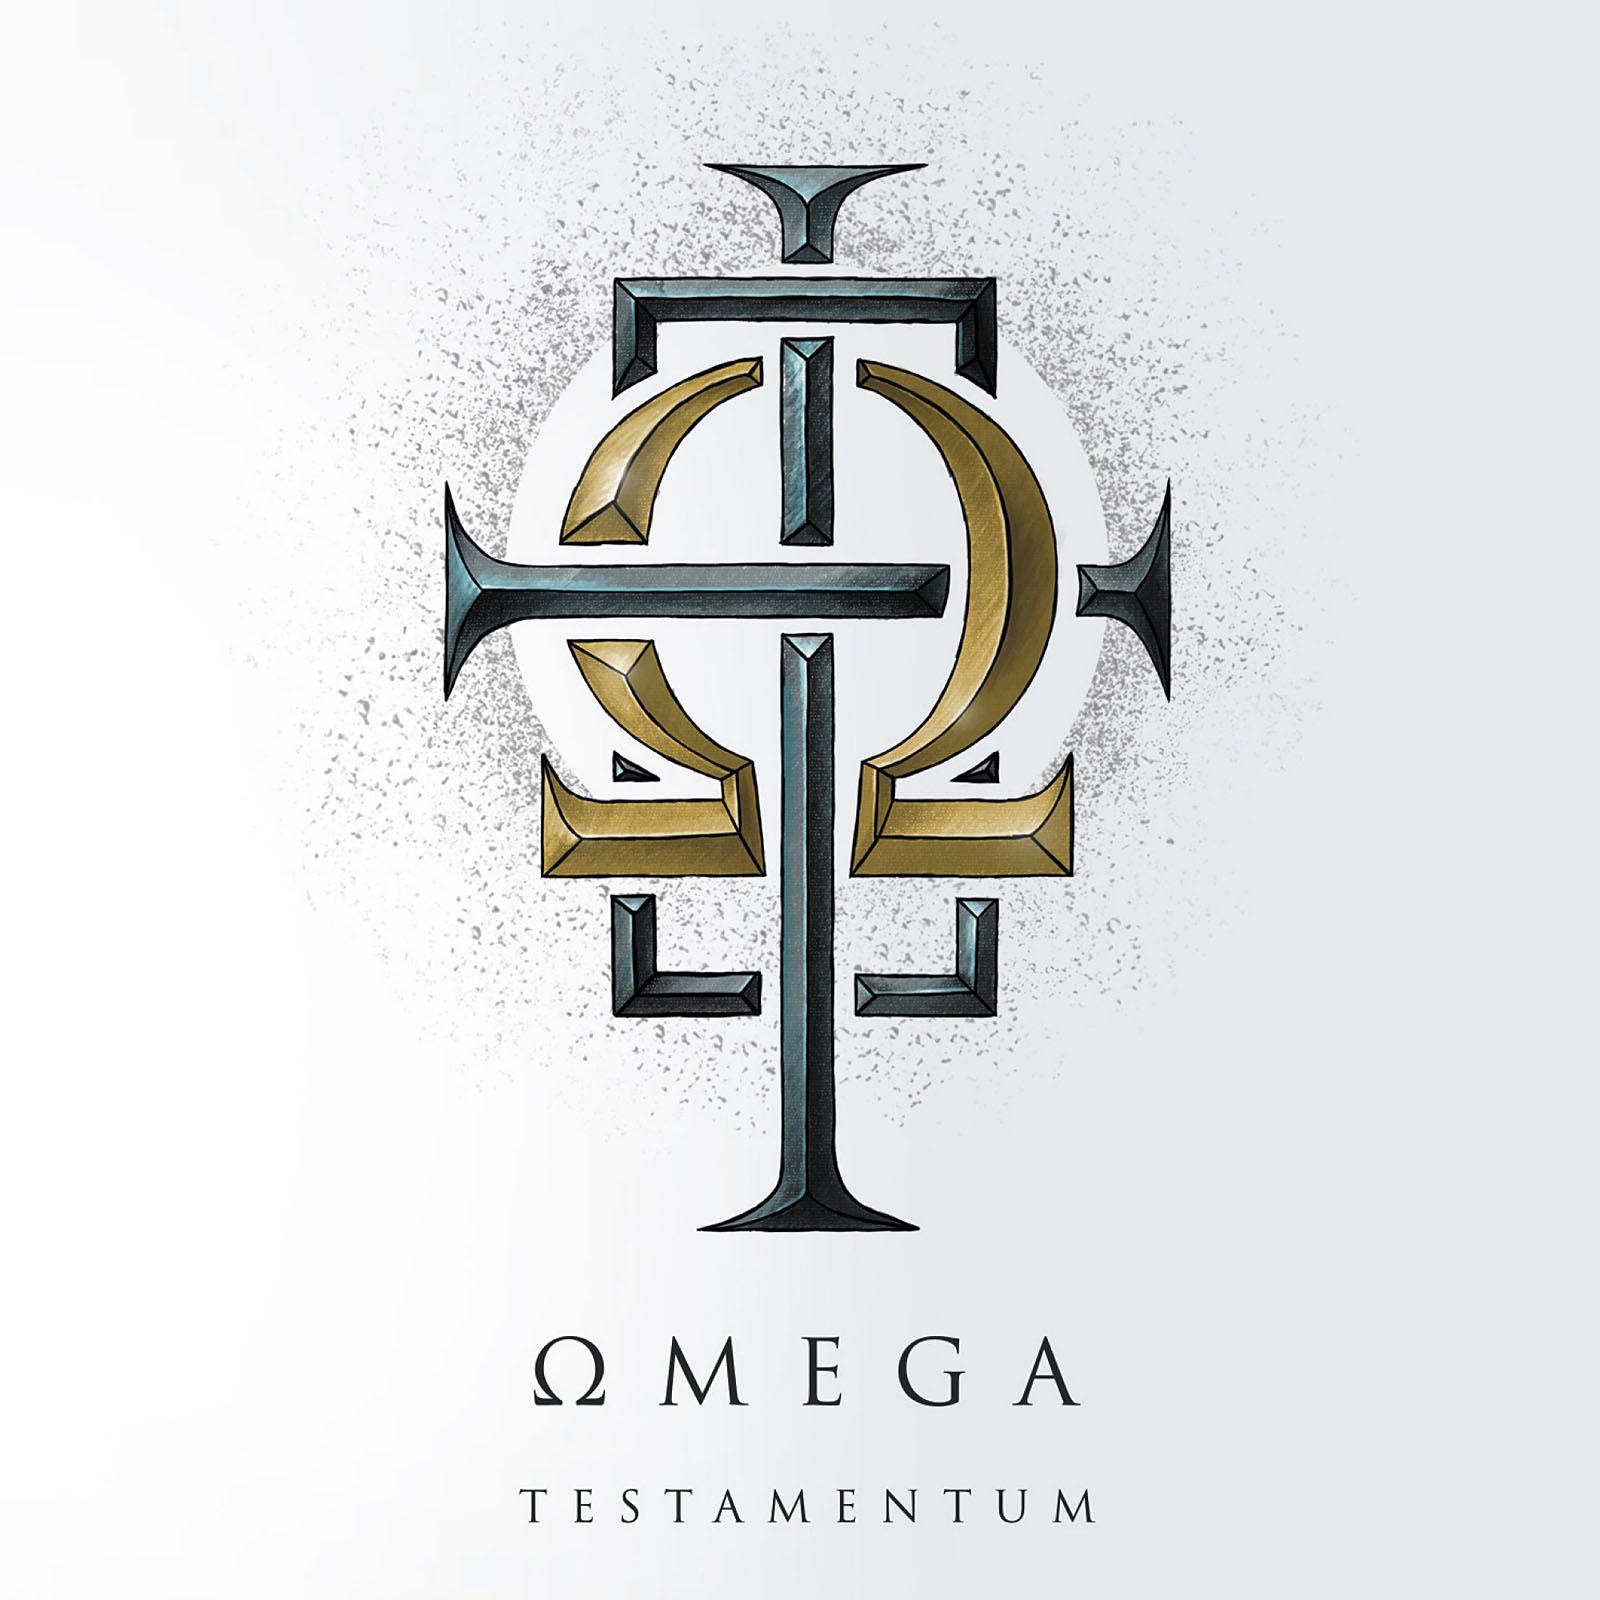 Omega_-_Testamentum_-_Cover_2000.jpg